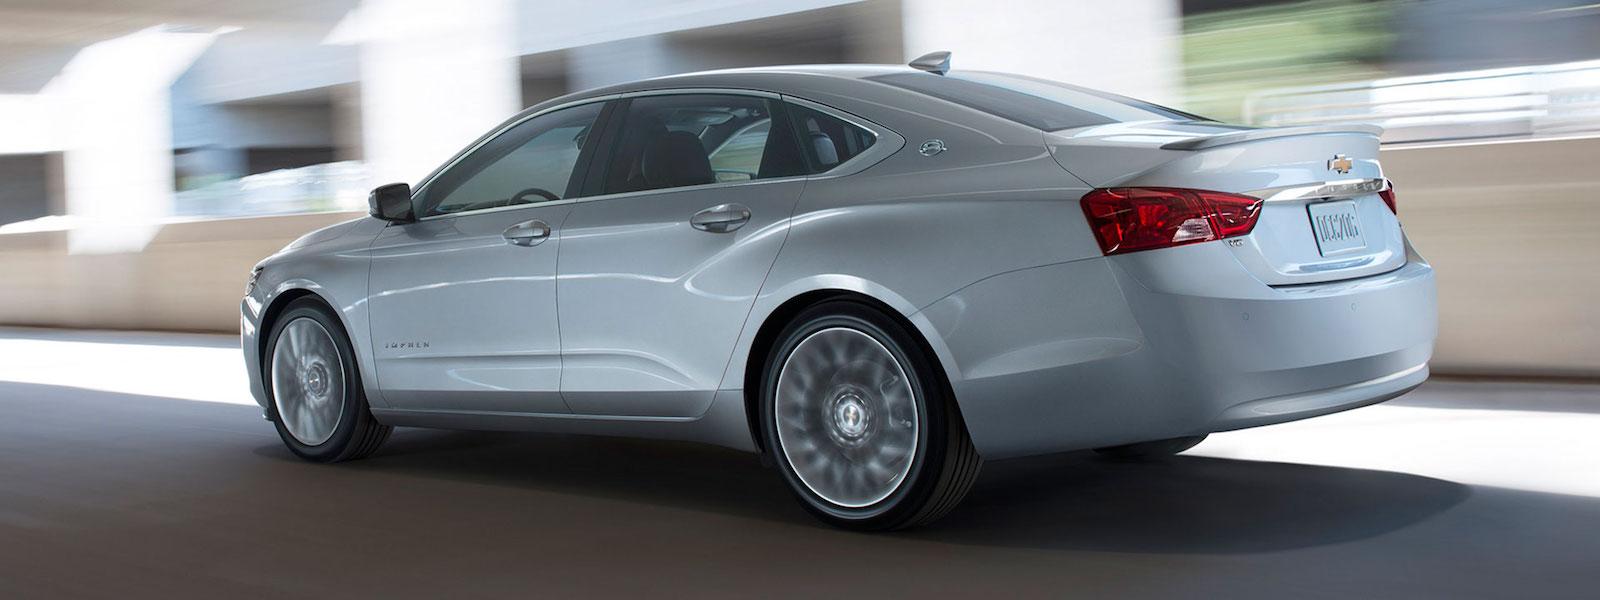 White 2016 Chevy Impala